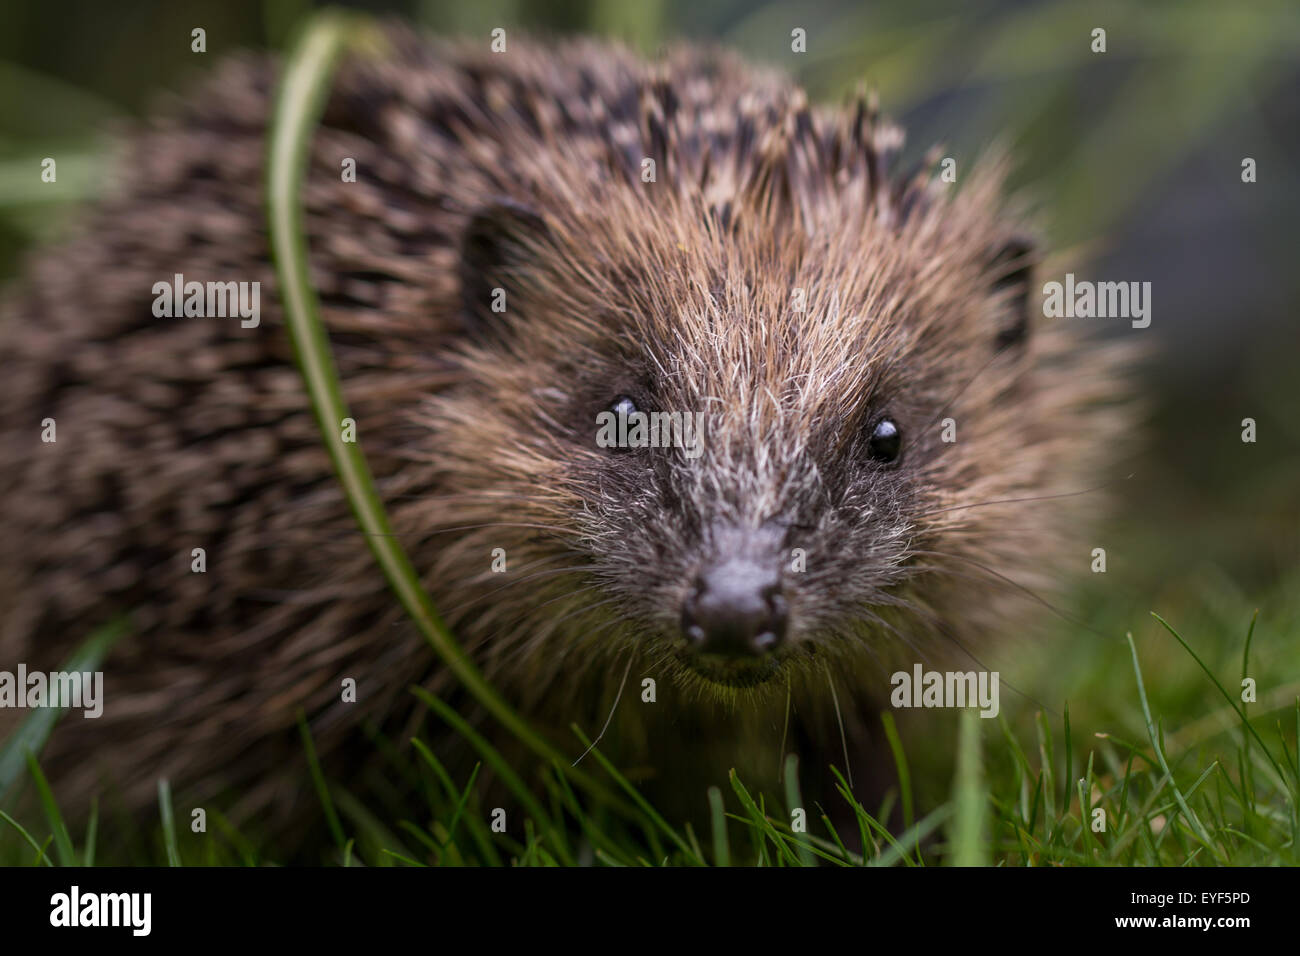 Young hedgehog (Erinaceus europaeus) looking at camera - Stock Image